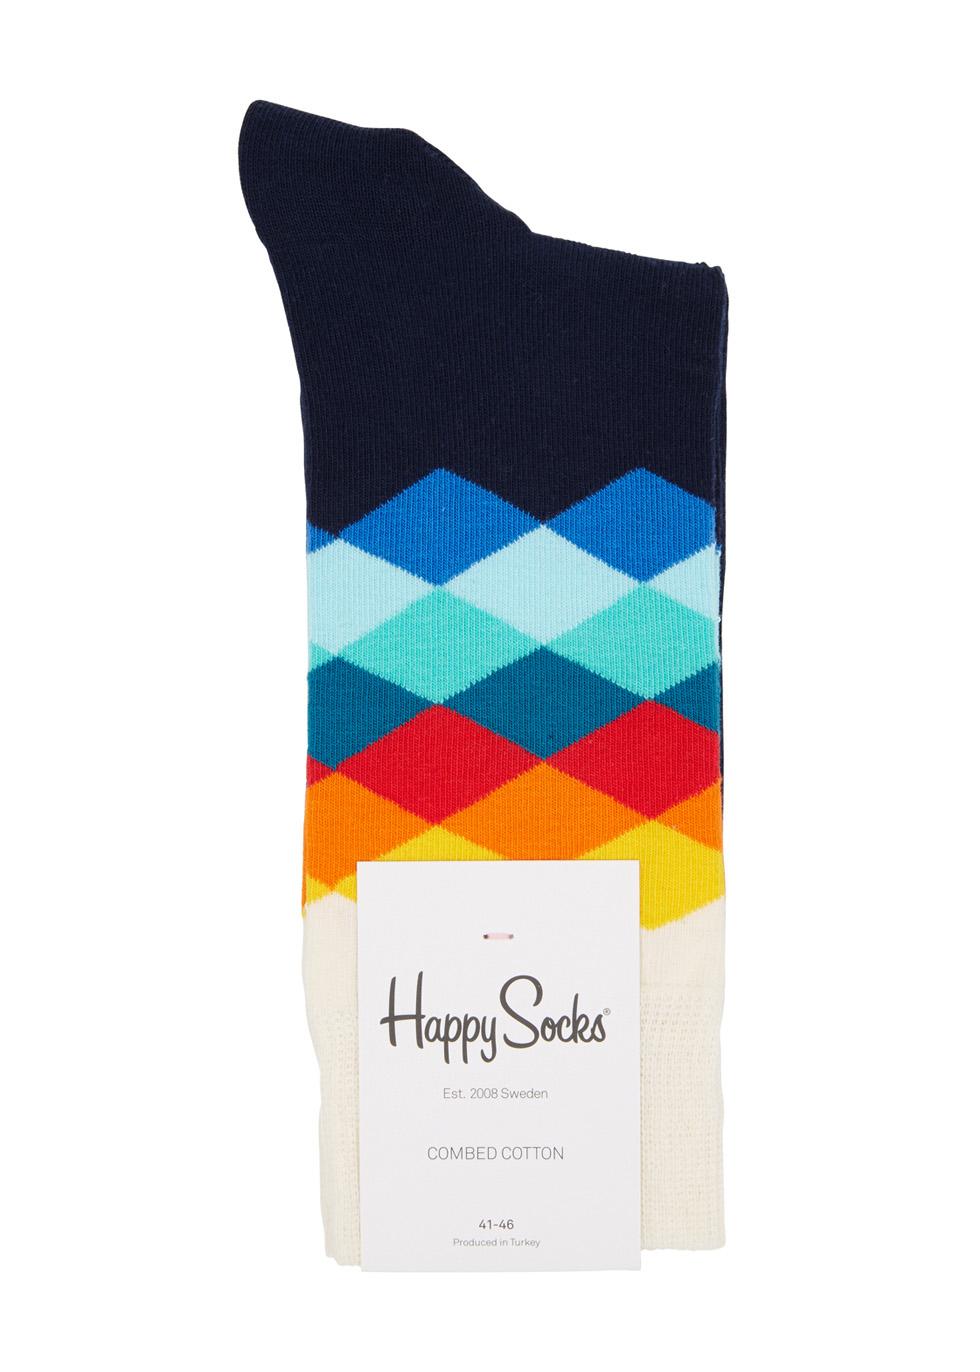 Faded Diamond navy cotton blend socks - Happy Socks